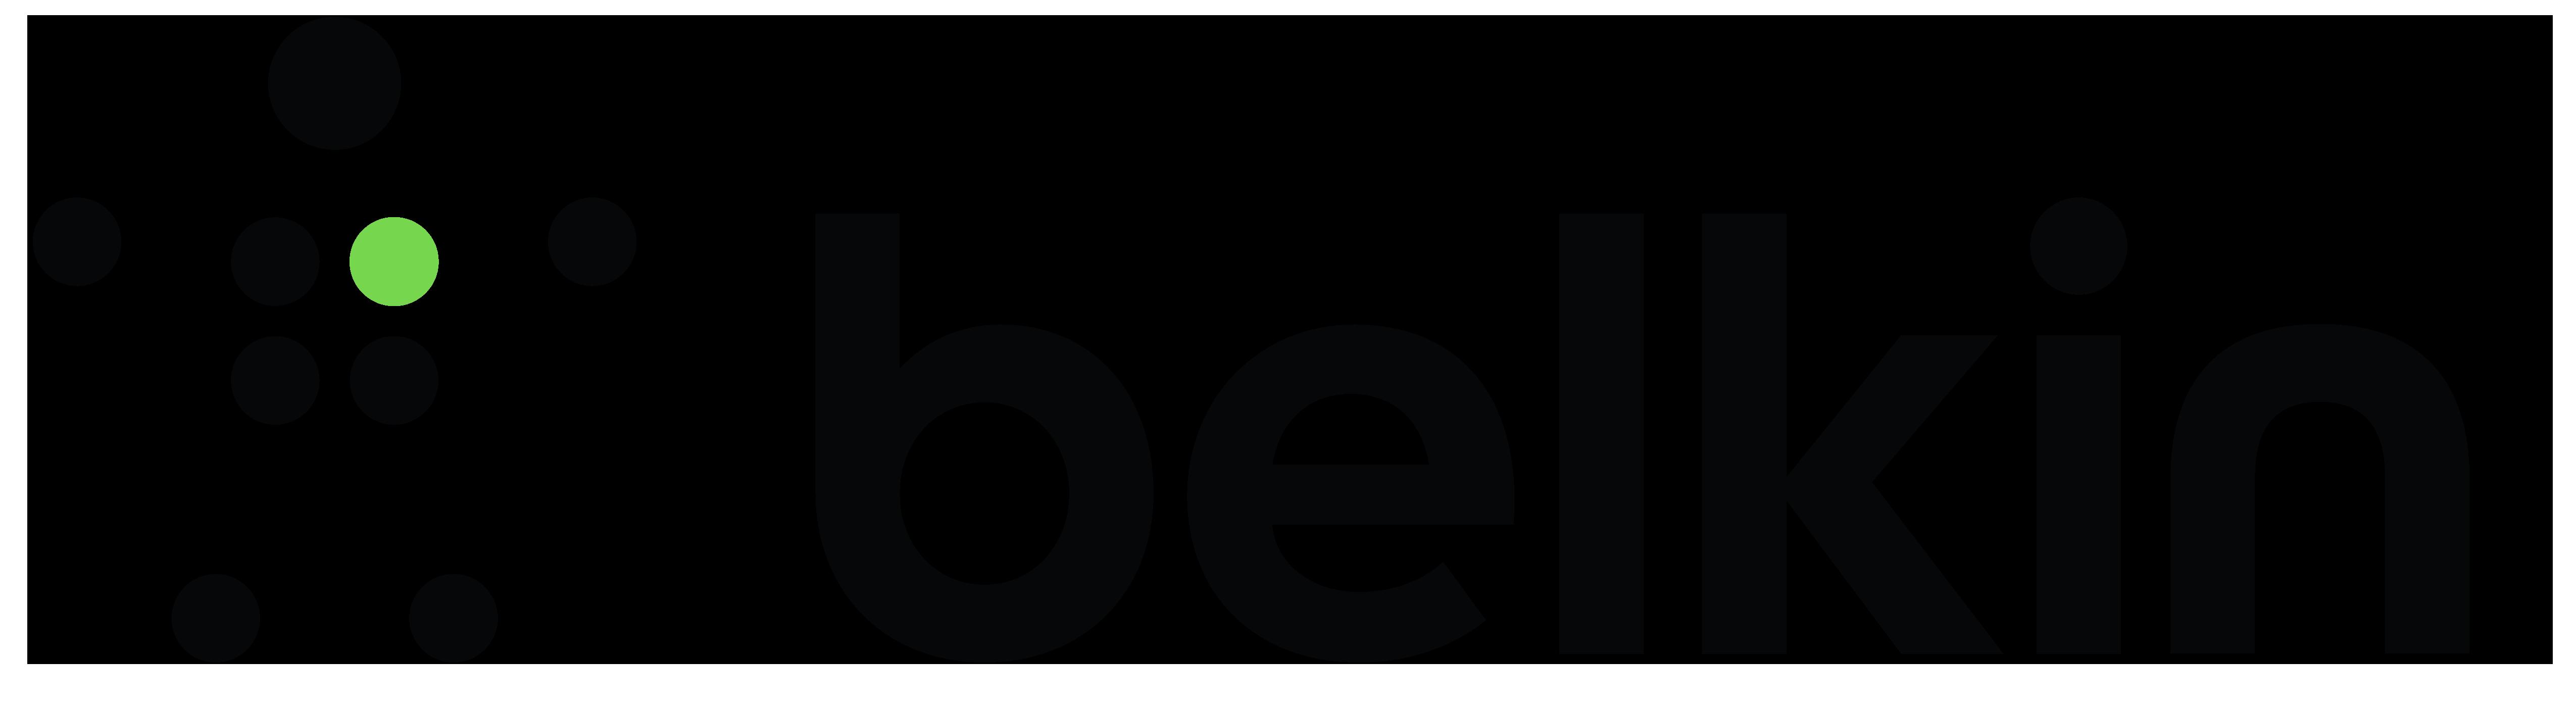 Belkin N300 Setup